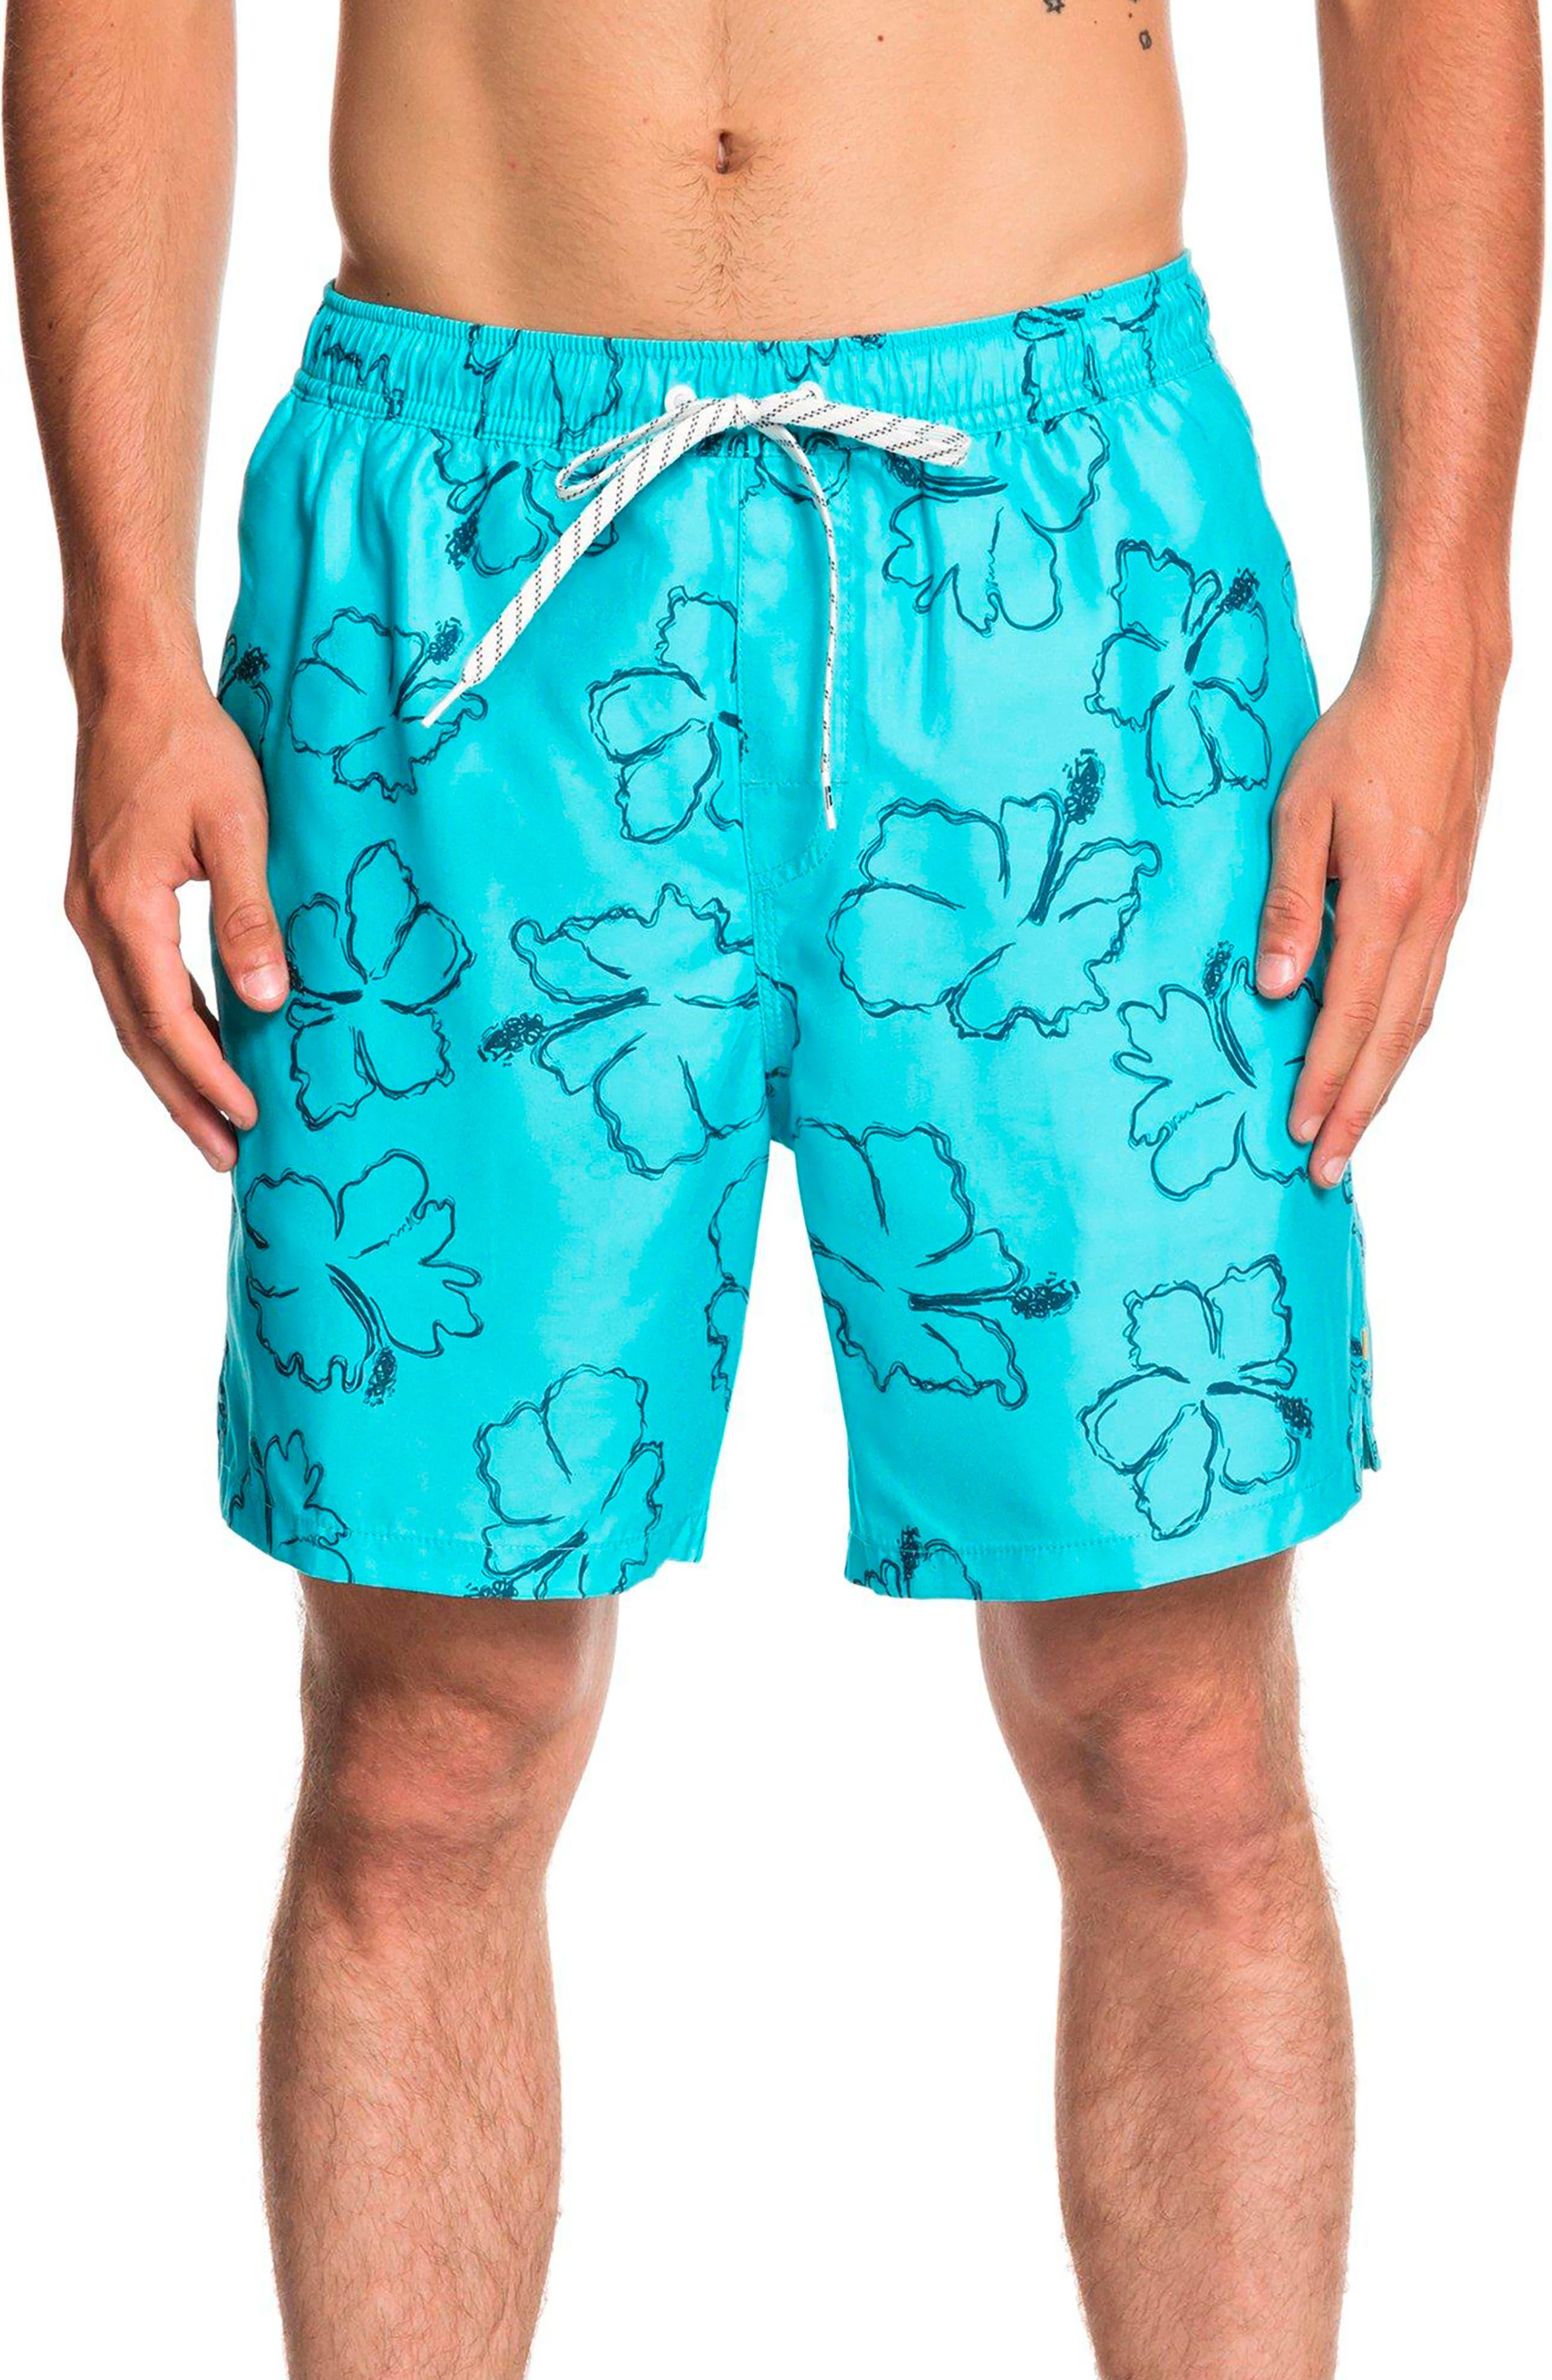 Quiksilver Waterman Collection Seasick Hilo Volley Swim Trunks, Blue/green